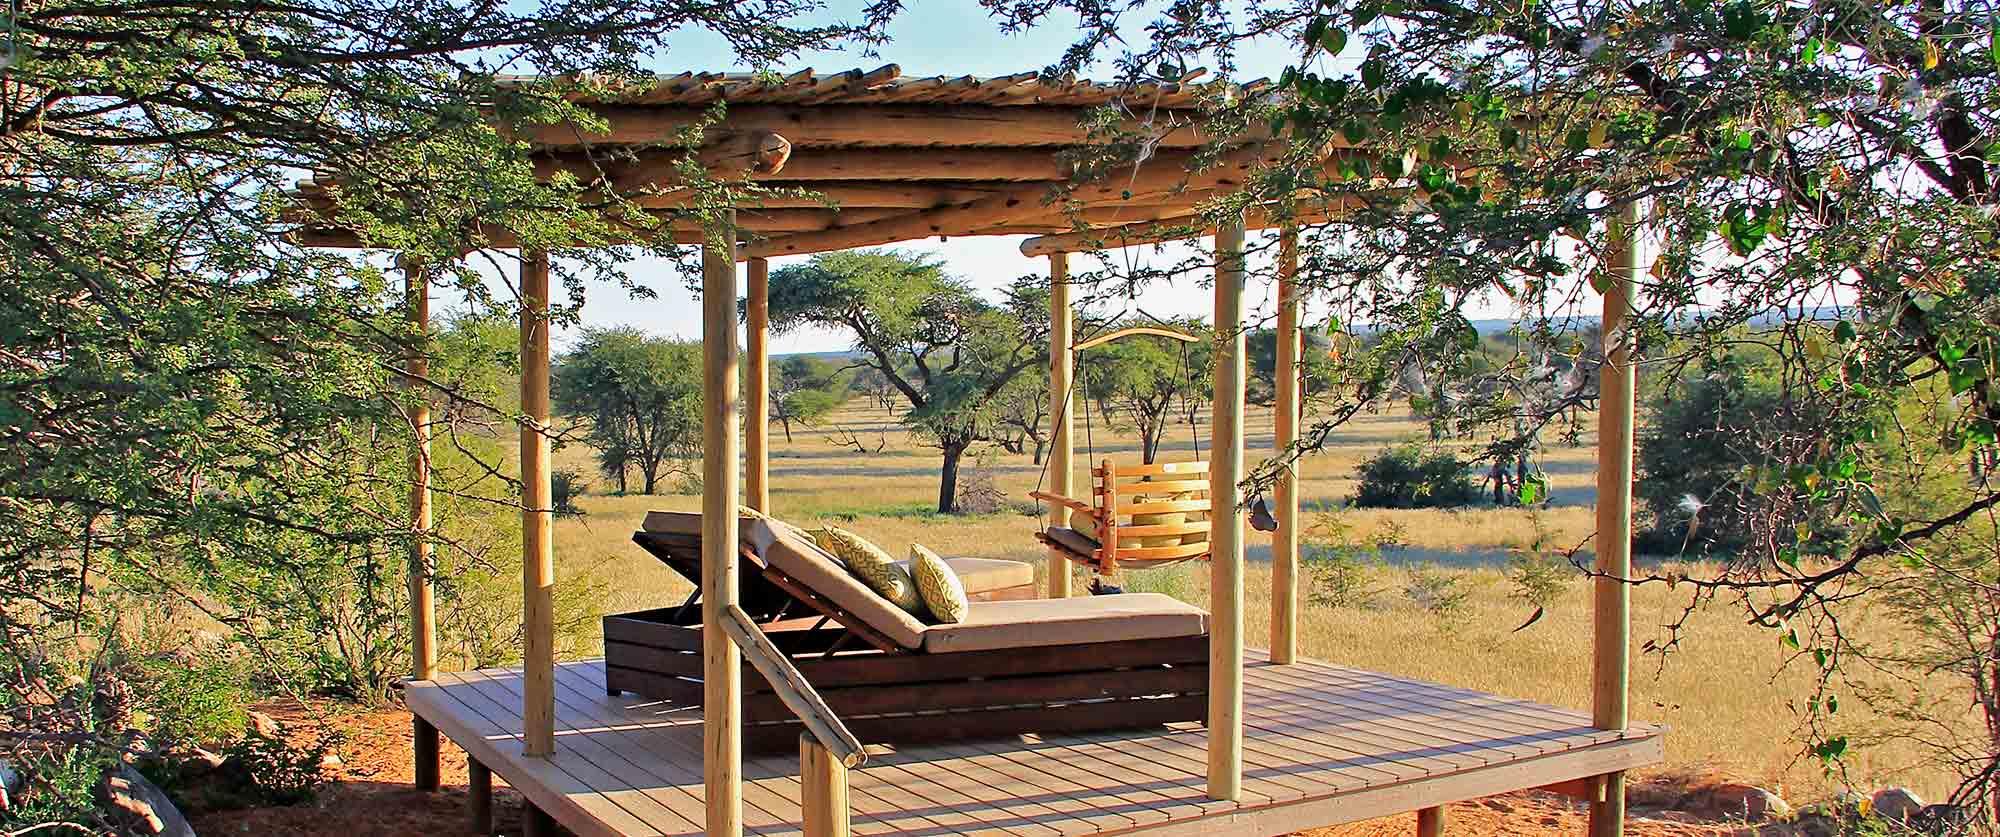 Otjimbondona Kalahari - Outdoor sala lounge